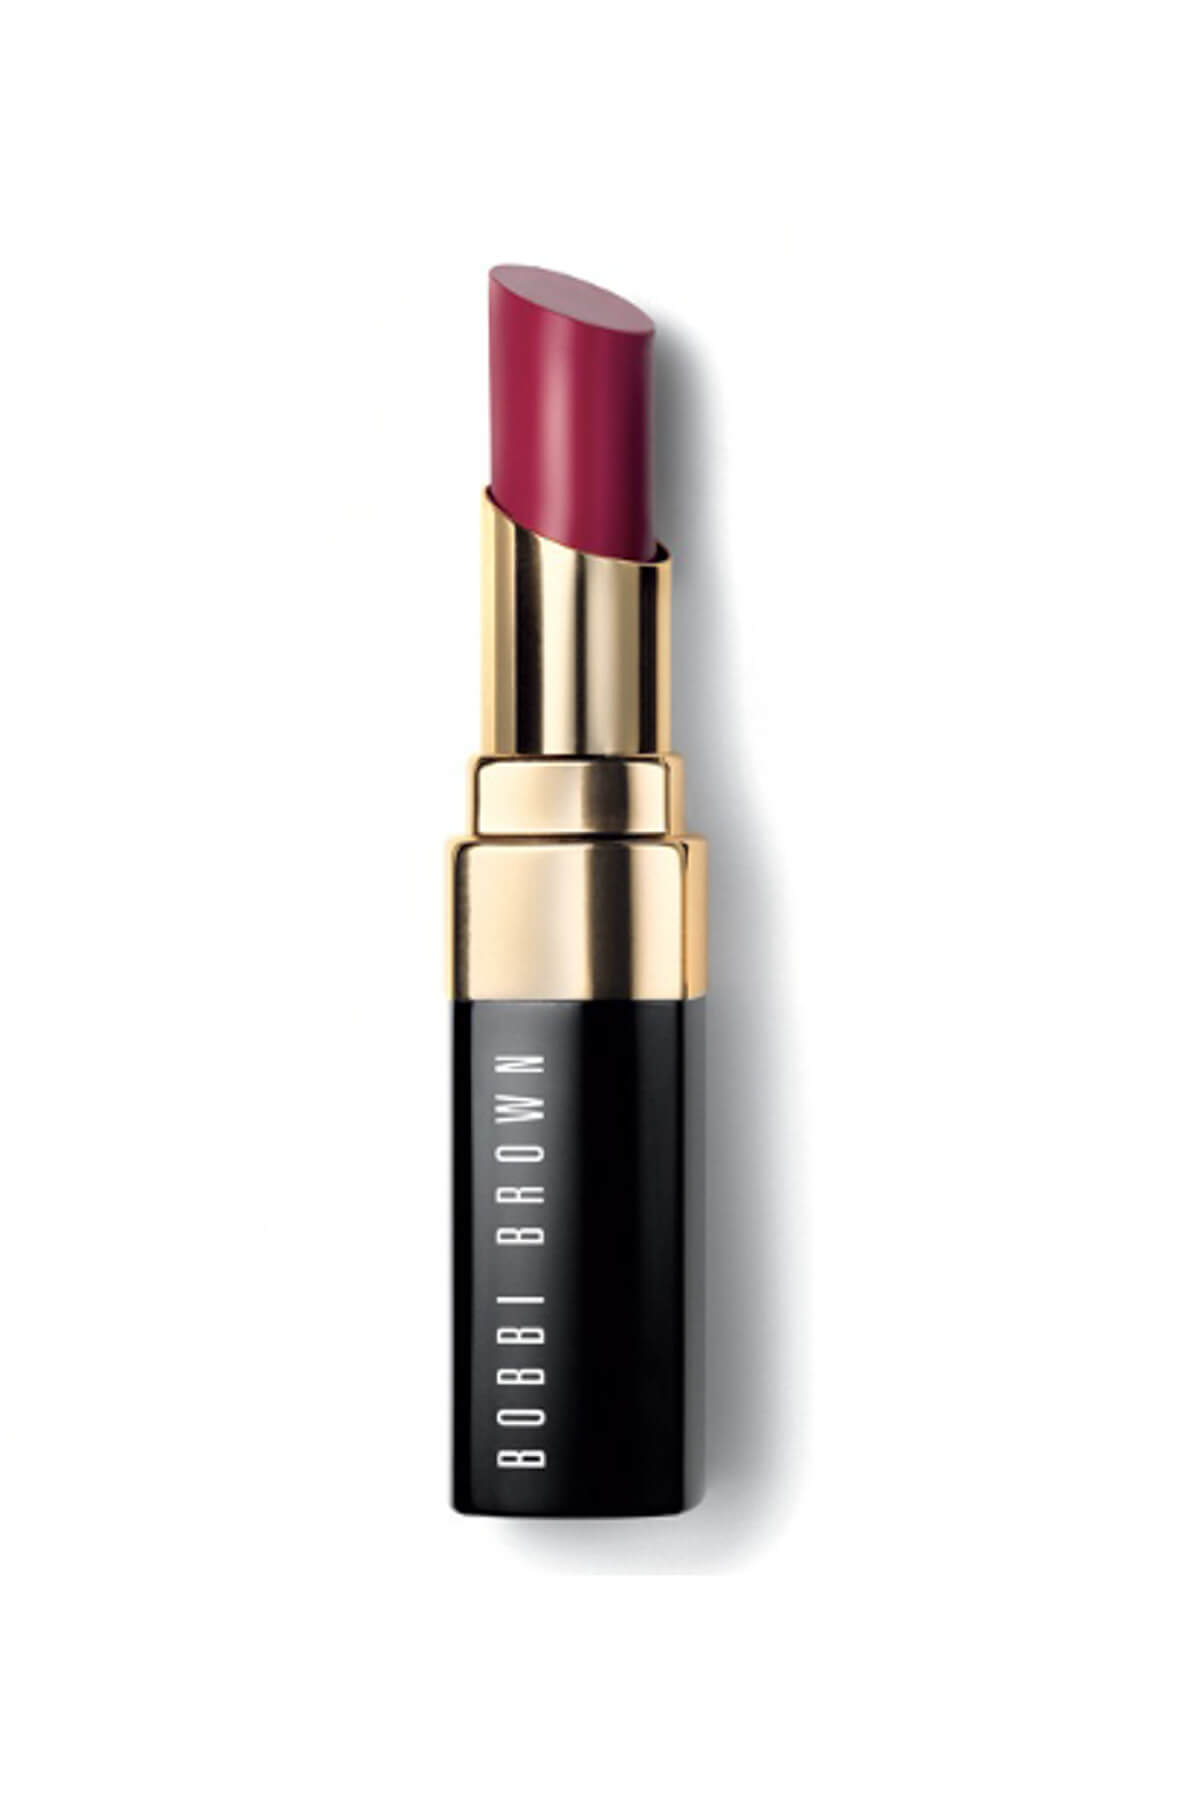 BOBBI BROWN Ruj - Nourishing Lip Color Coral Pink 2.3 g 716170192192 1